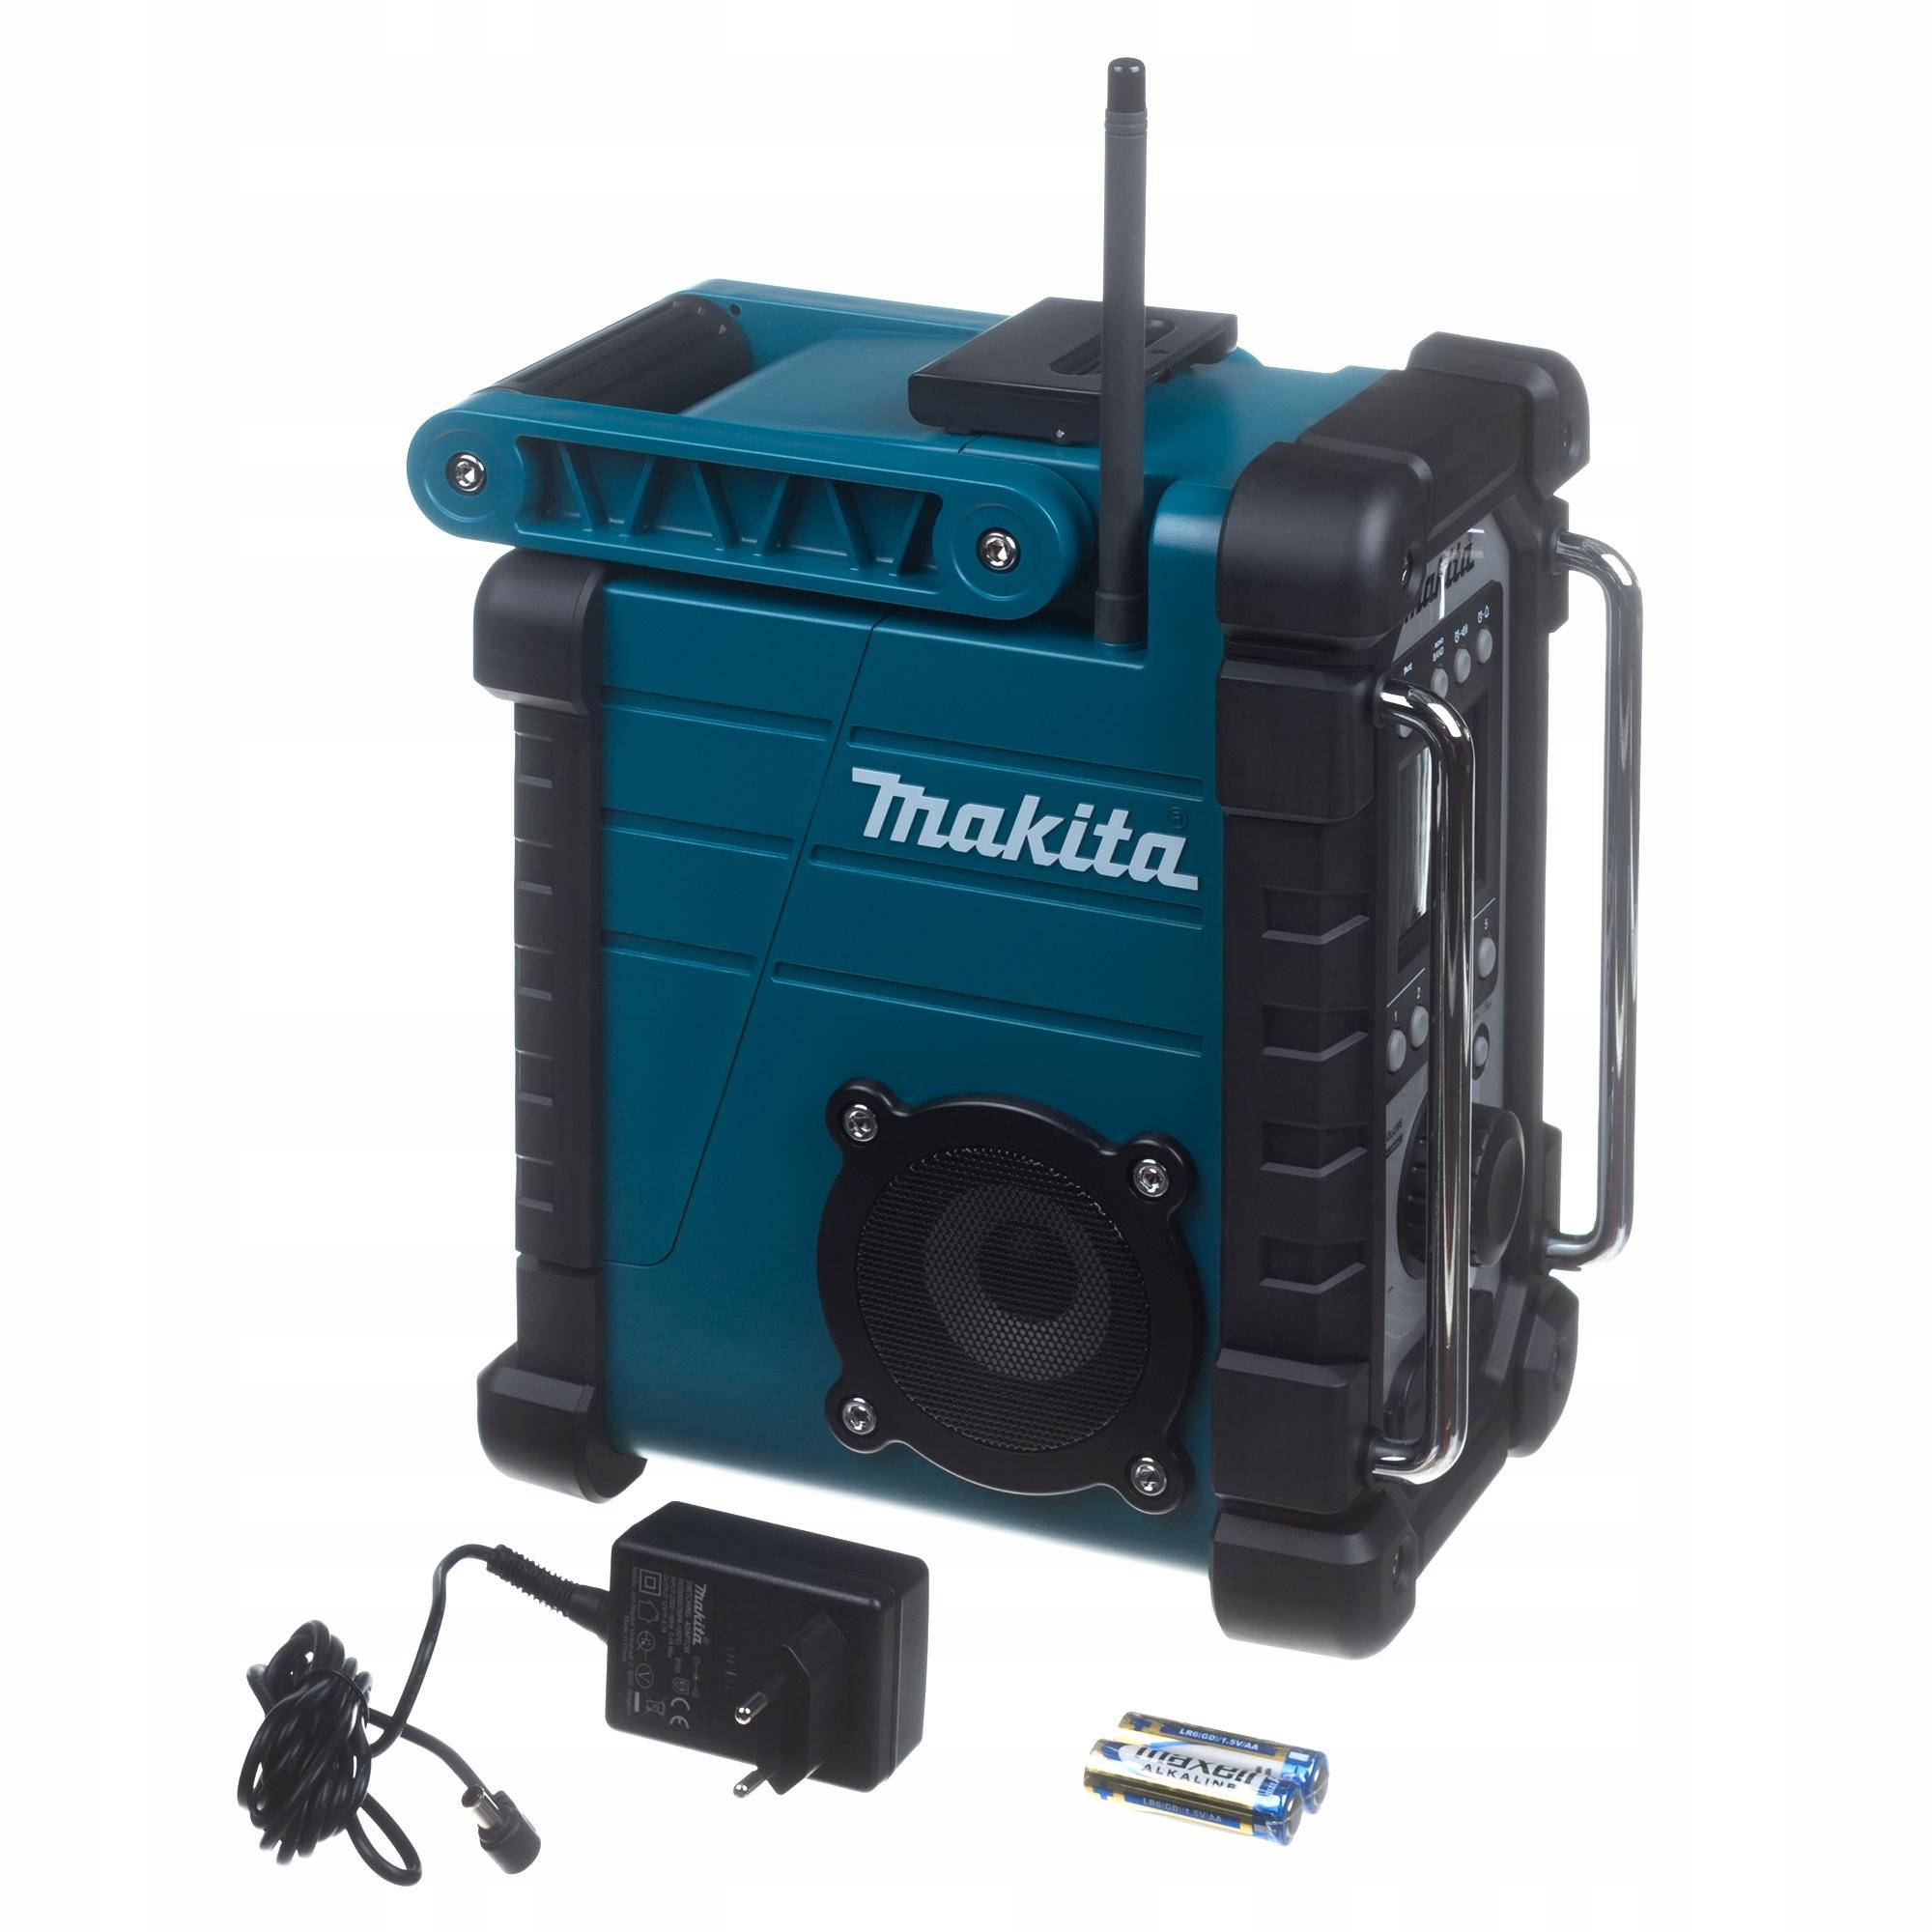 Radio budowlane Makita DMR107 akumulatorowe elektr